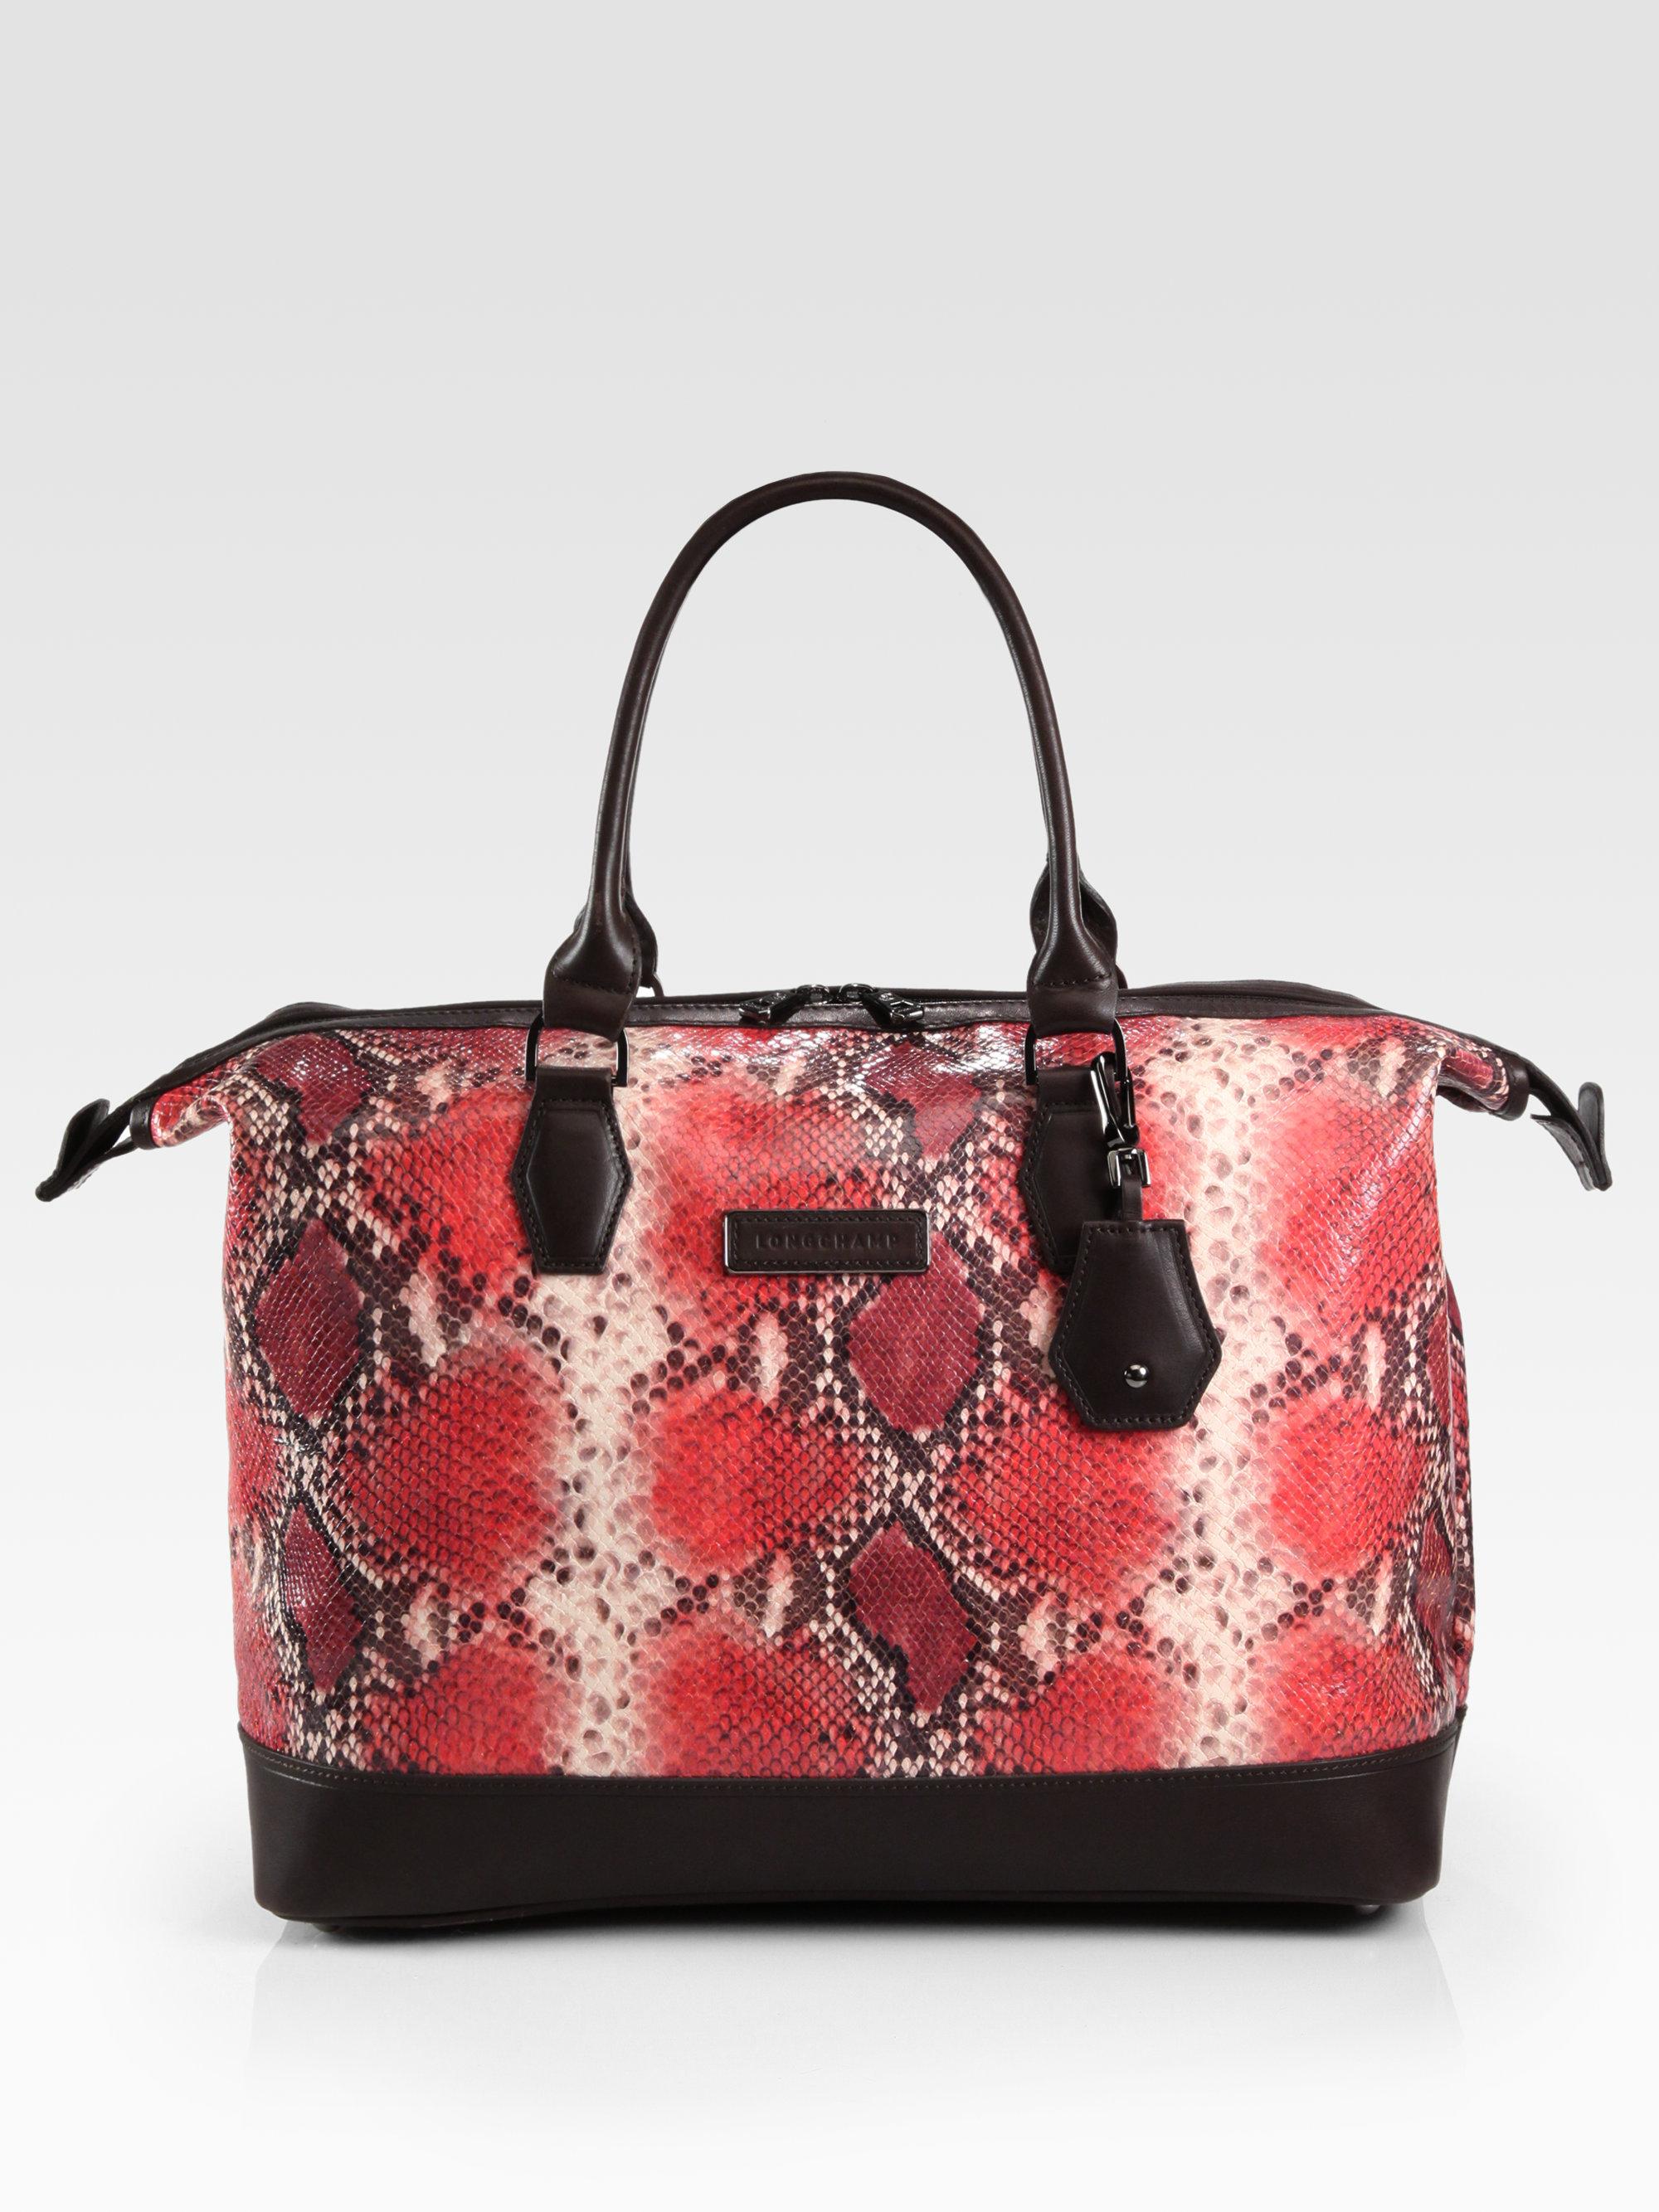 fe1deafc7f2ba2 Longchamp Legende Souple Snake Embossed Leather Top Handle Bag in ...